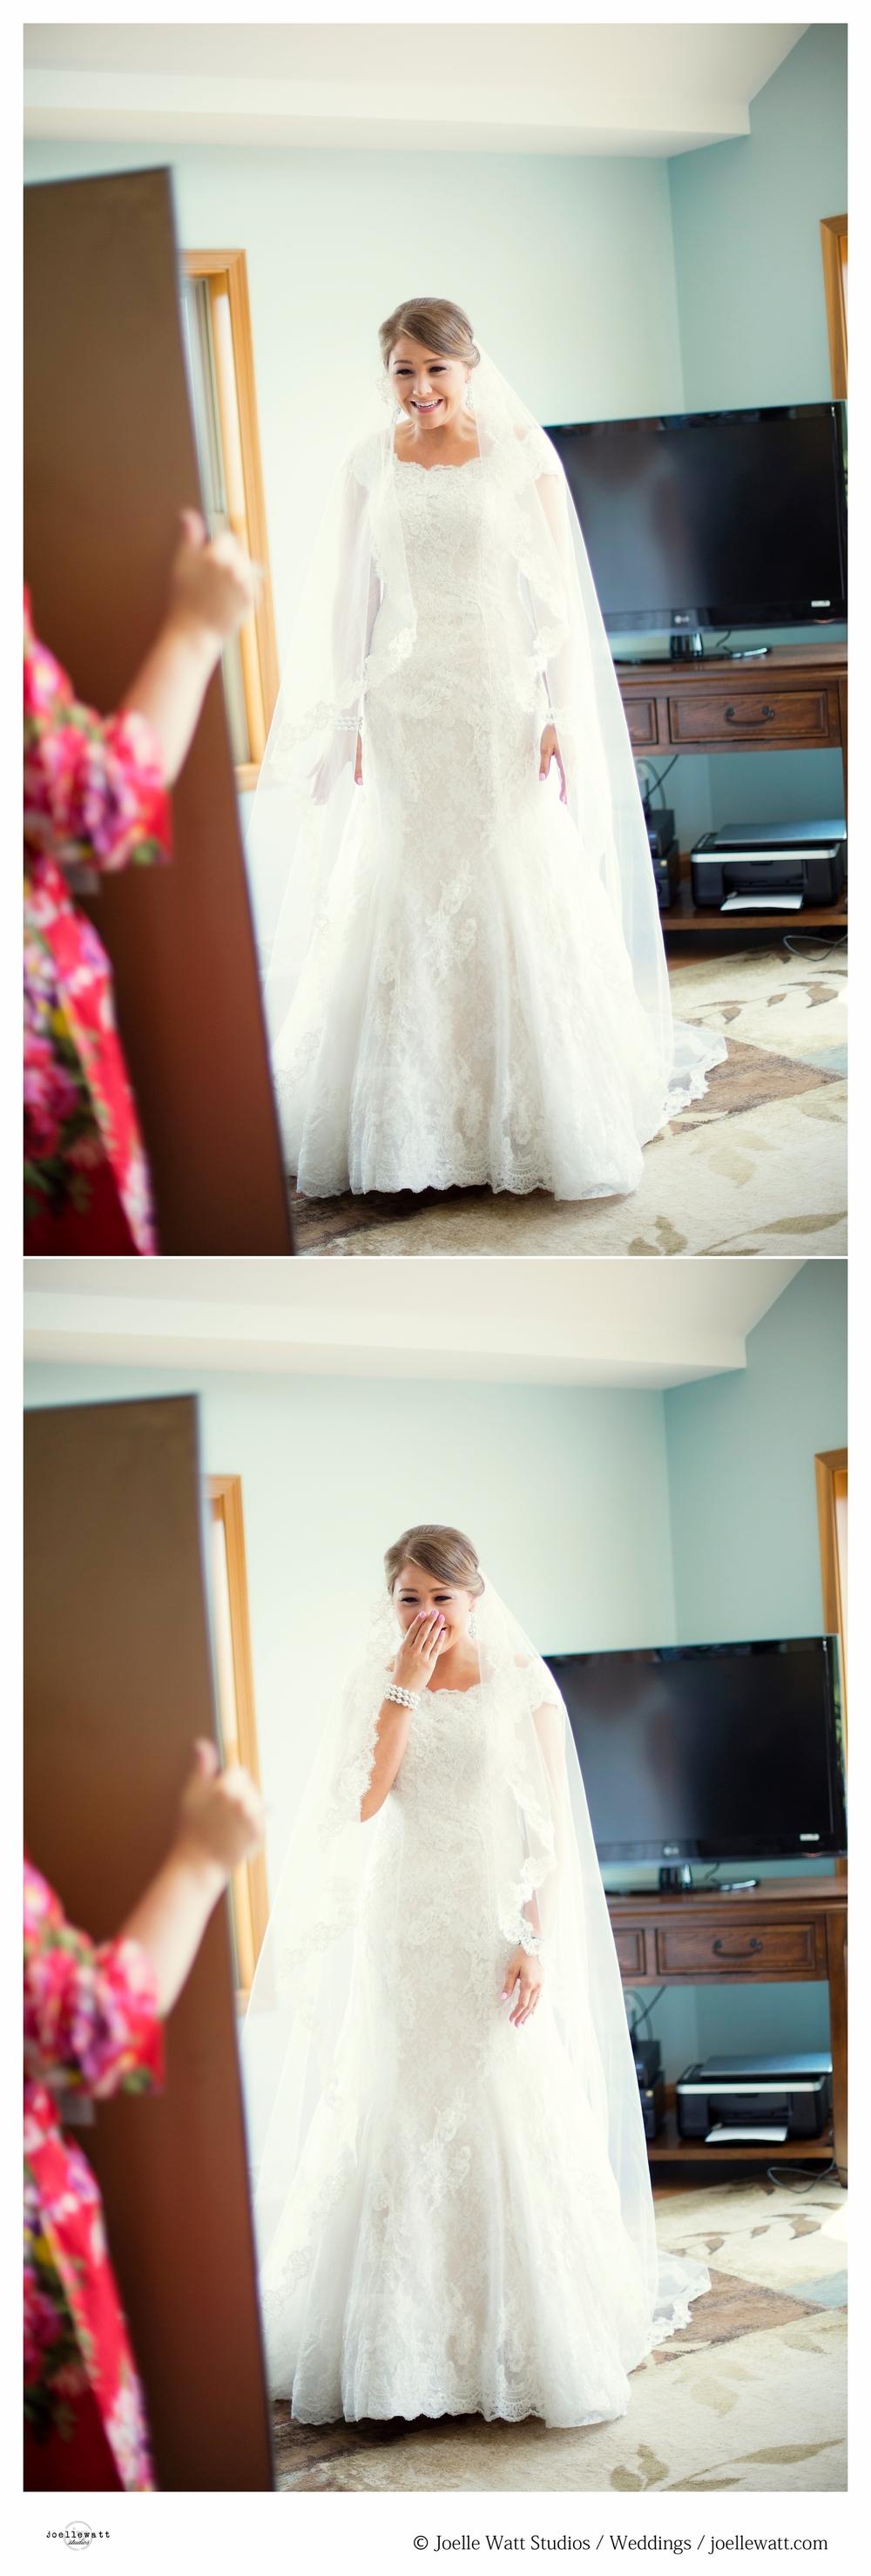 Terwiske Wedding 6.jpg